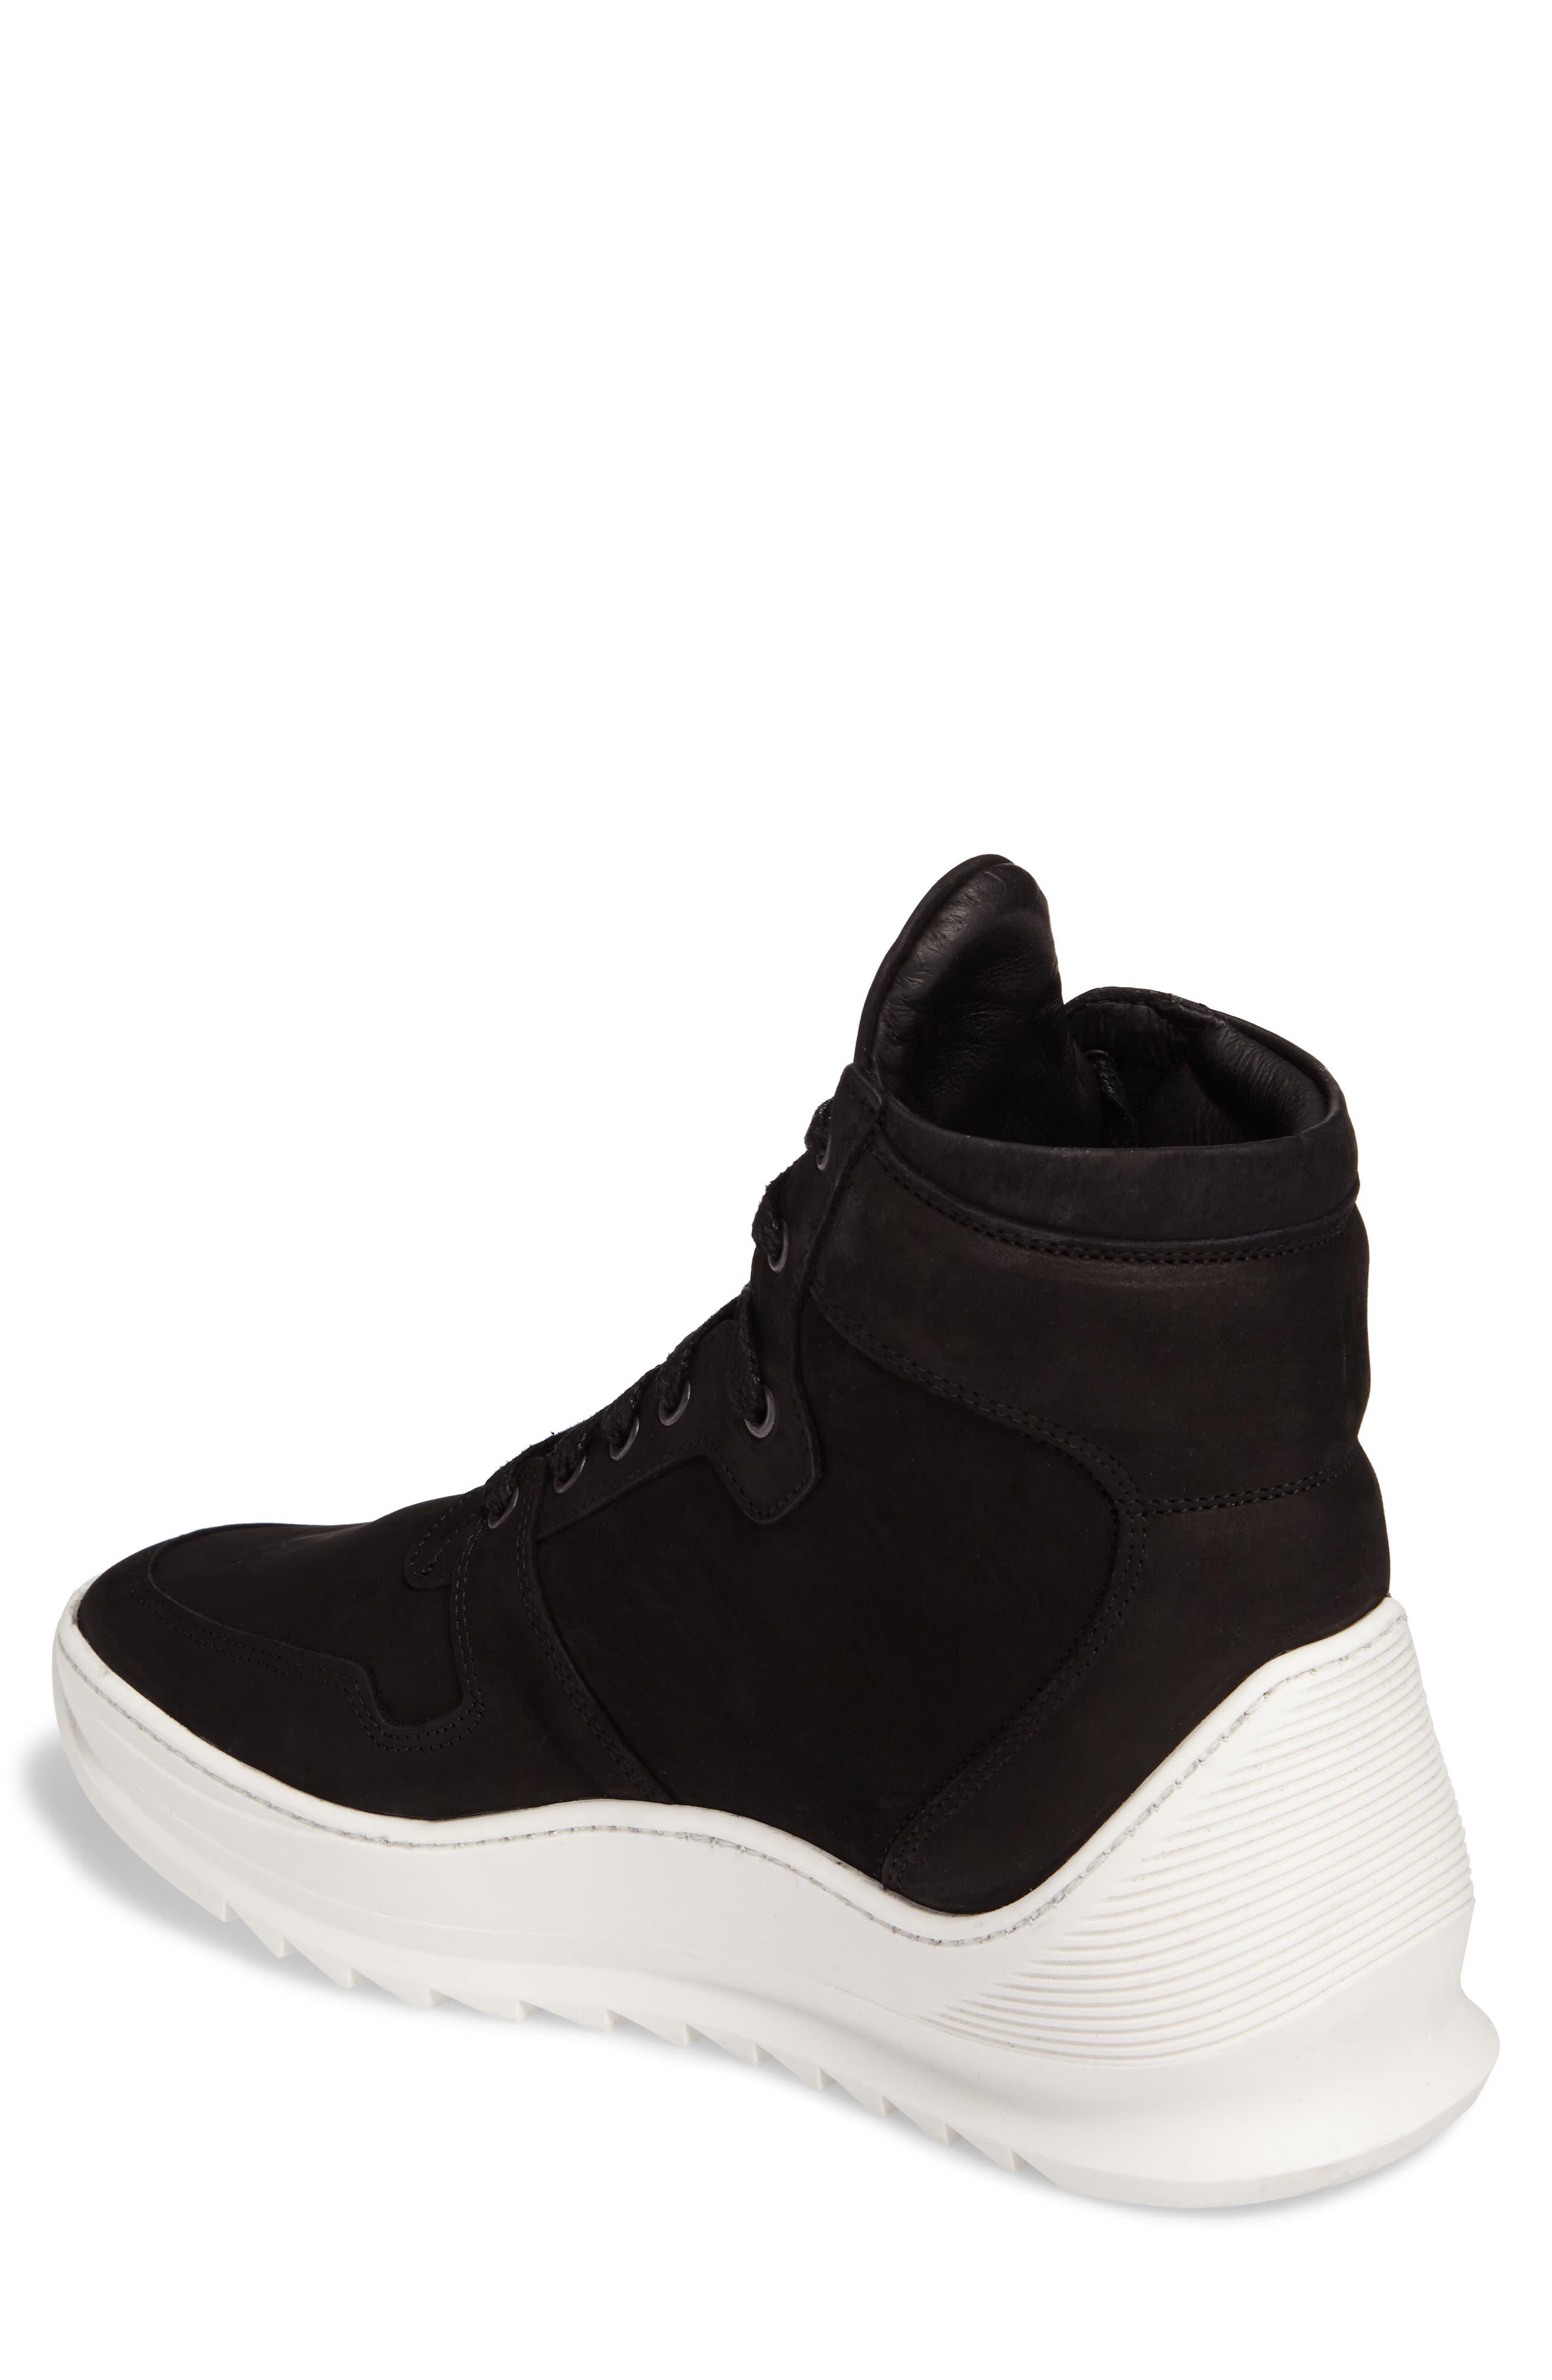 Transformed Sneaker,                             Alternate thumbnail 2, color,                             001